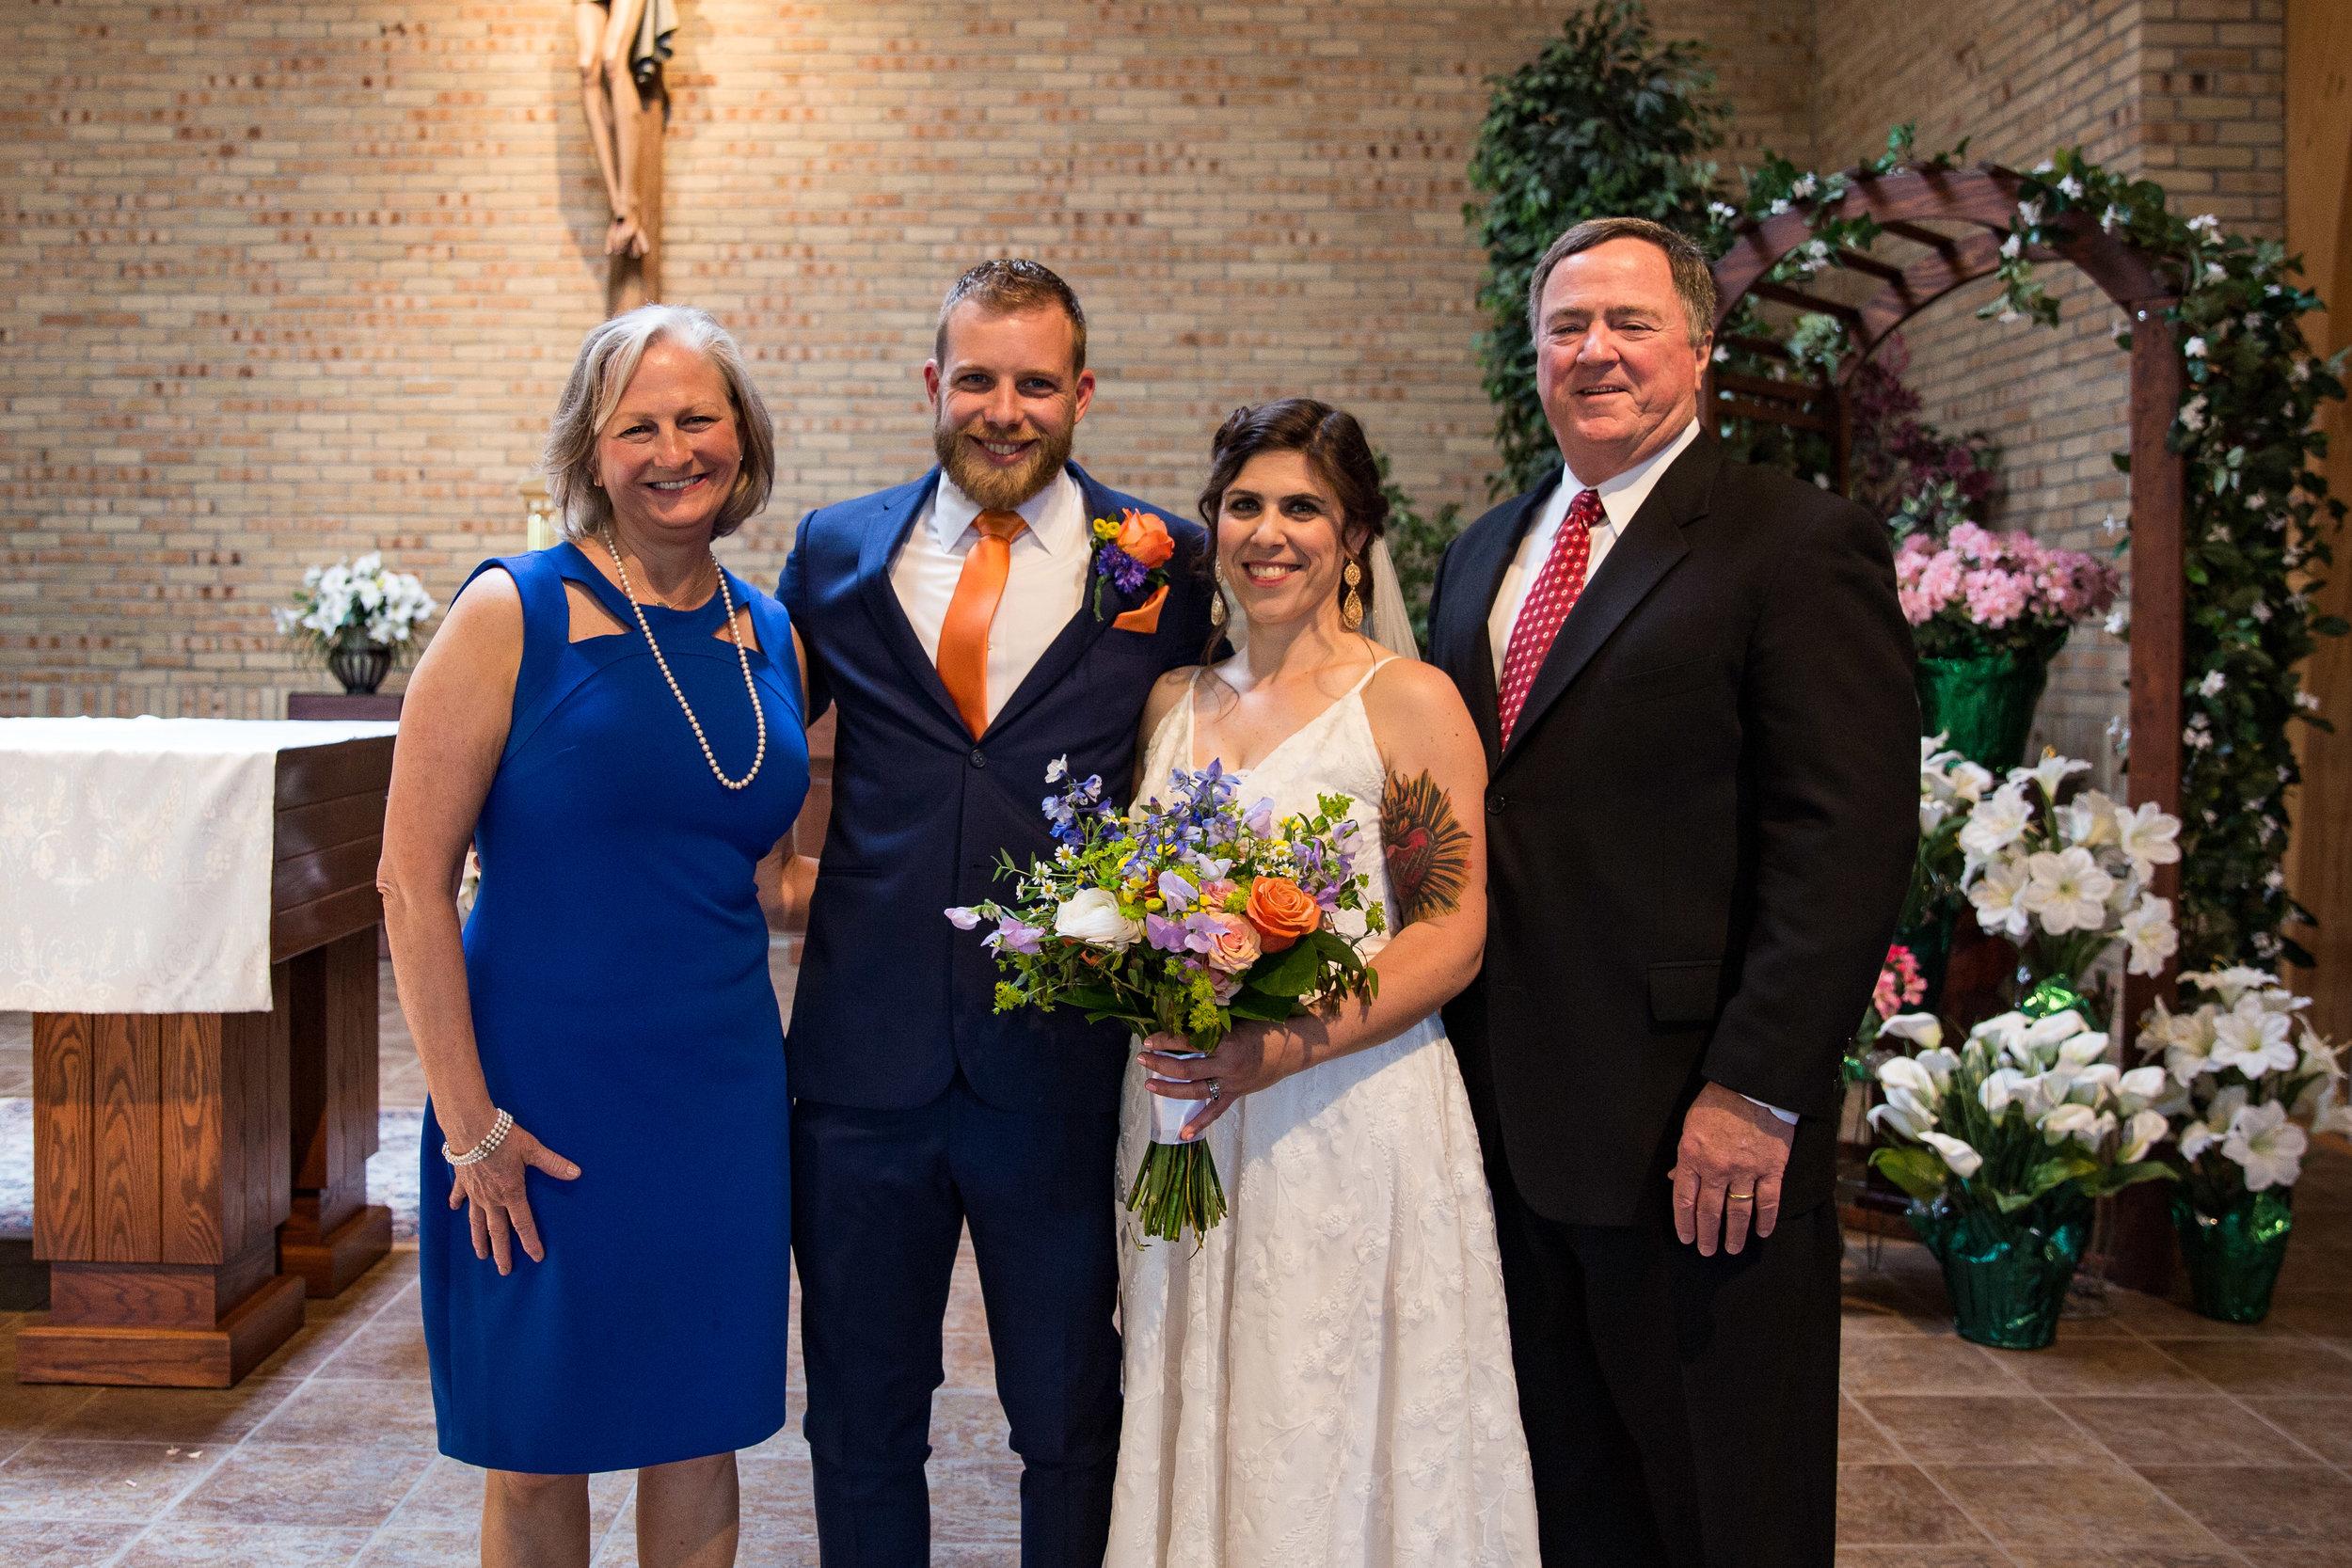 Natalie and Dallas Mooney Wedding 6-8-19_Tania Watt Photography-194.jpg